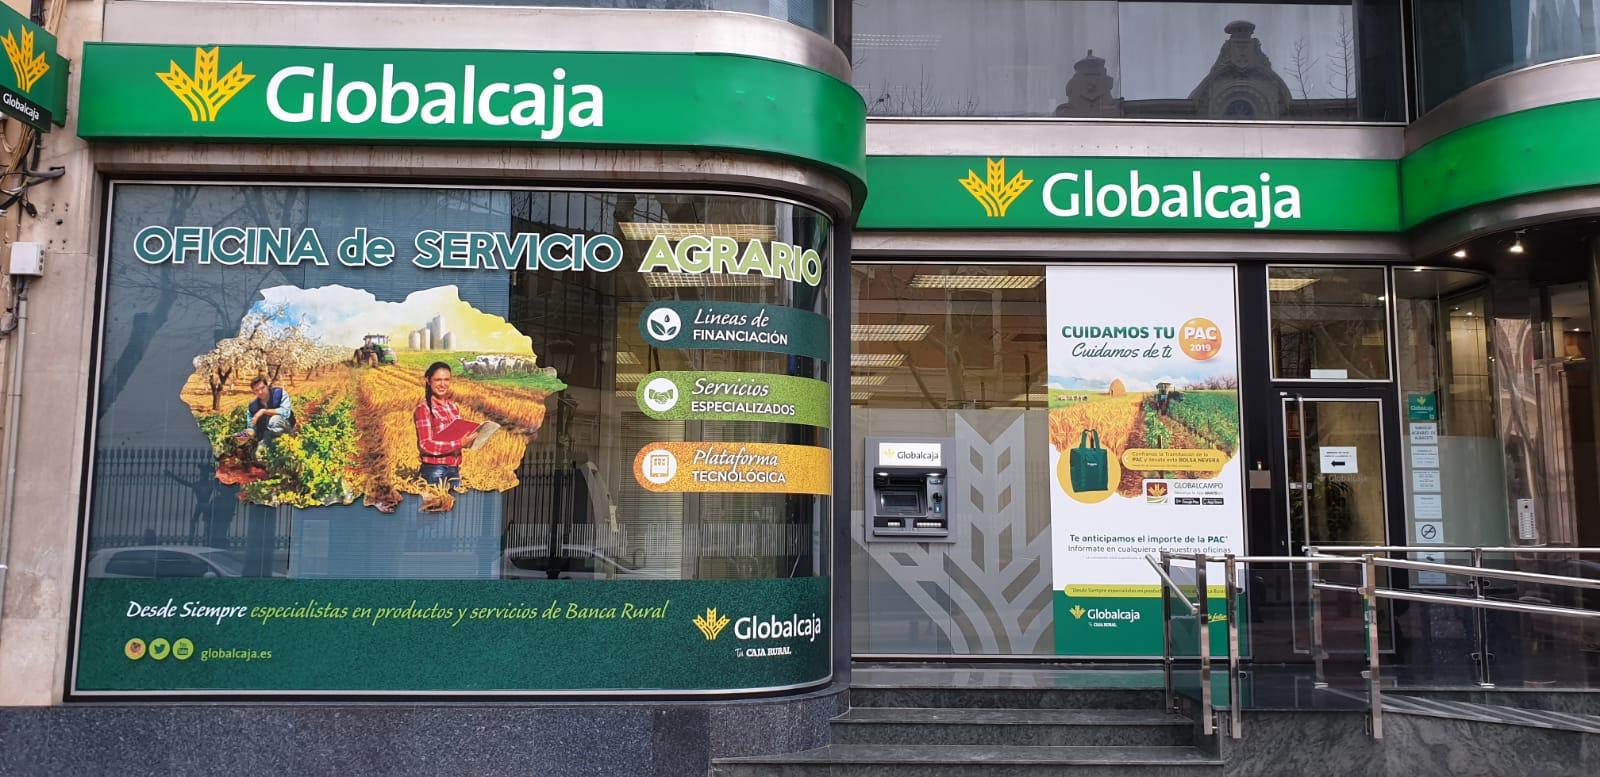 https://blog.globalcaja.es/wp-content/uploads/2020/02/ayudas-viñedo.jpg